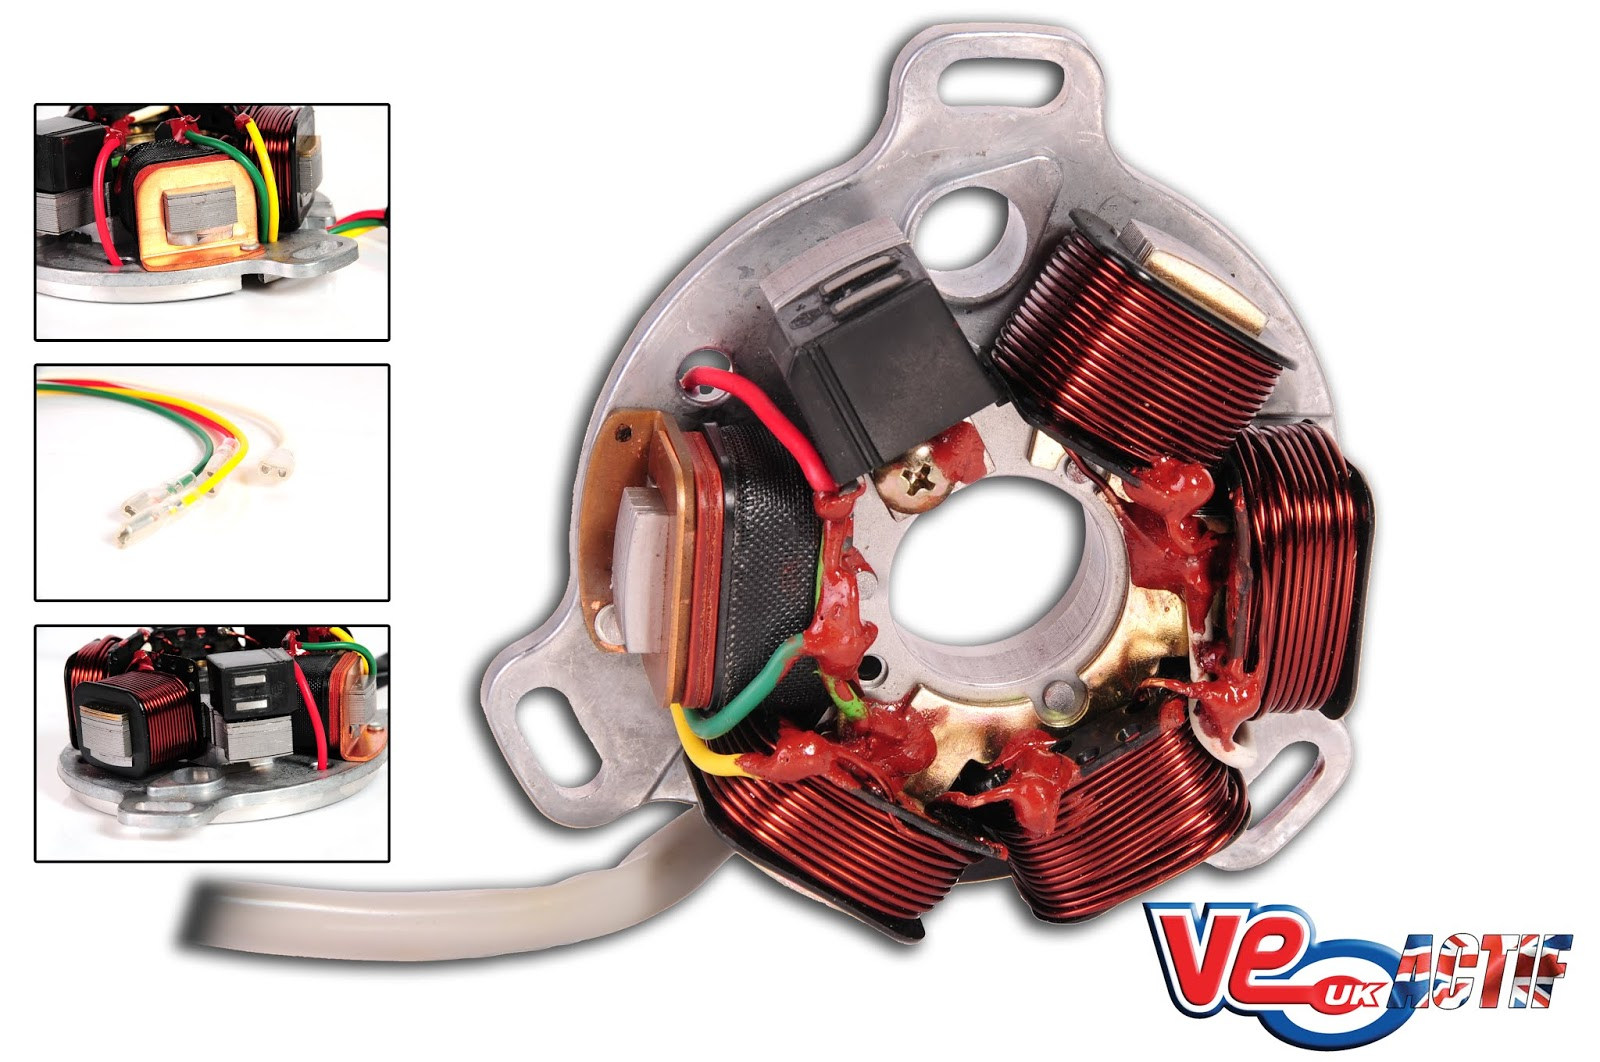 VE Actif Lambretta 12v AC Stator Plates